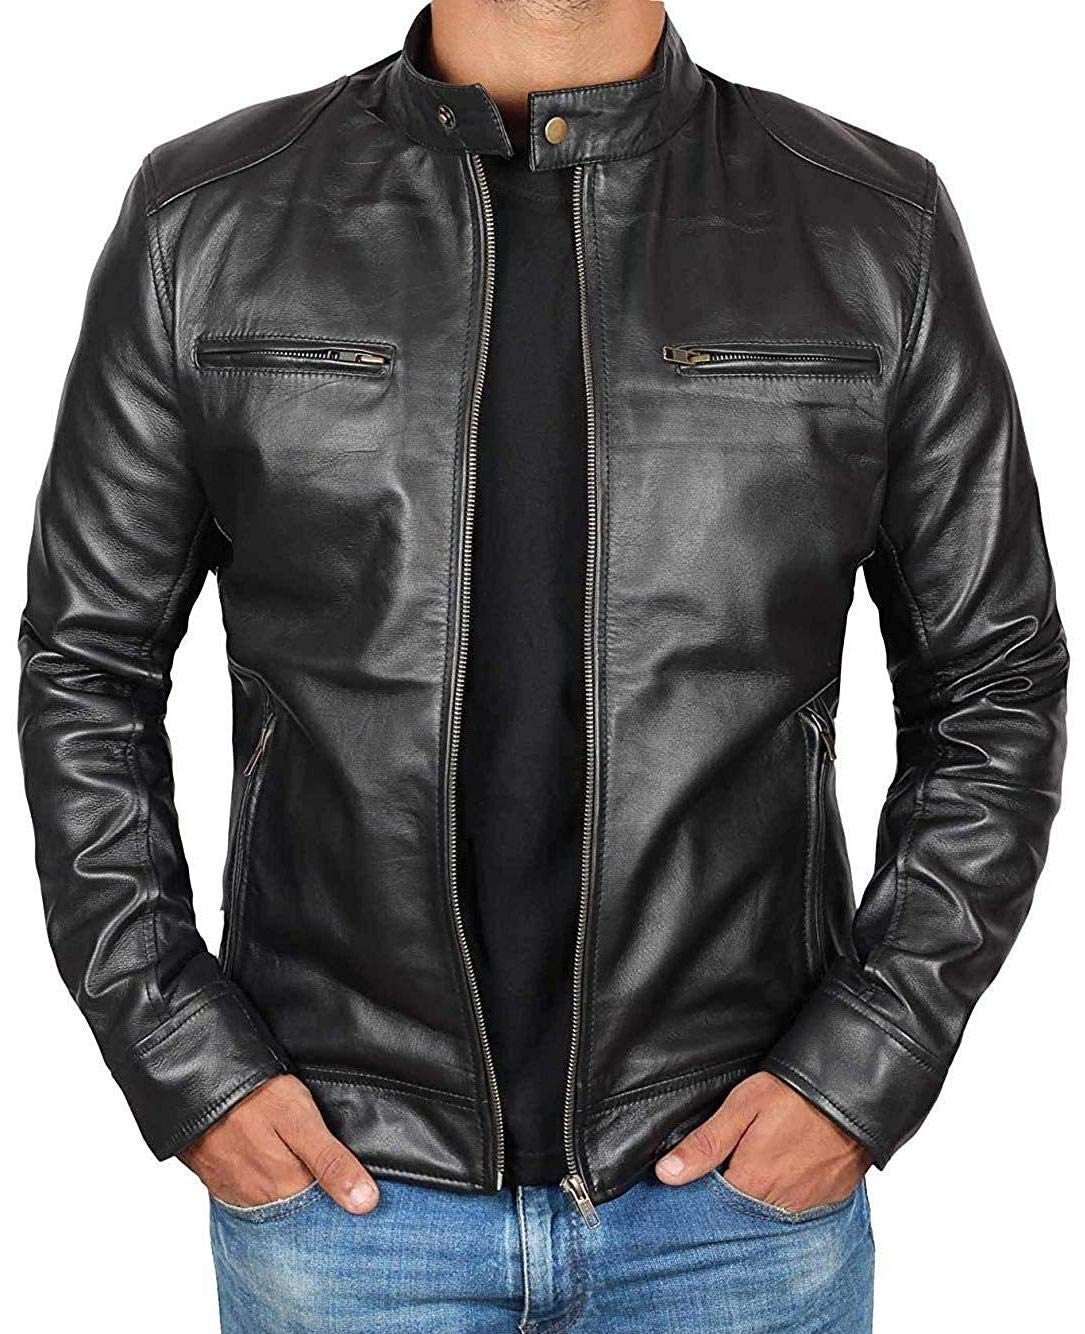 BlingSoul Genuine Lambskin Black Leather Jacket for Men   [1100123] Dodge - M